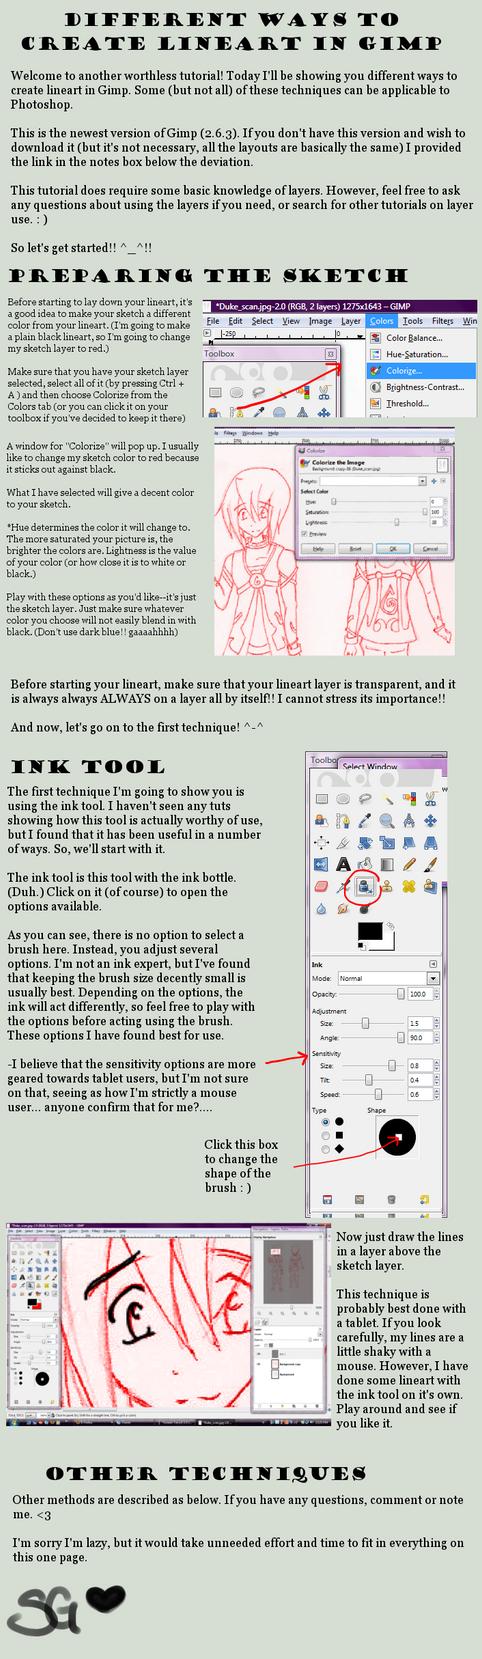 Line Art In Gimp : Lineart guide for gimp by shimagenki on deviantart